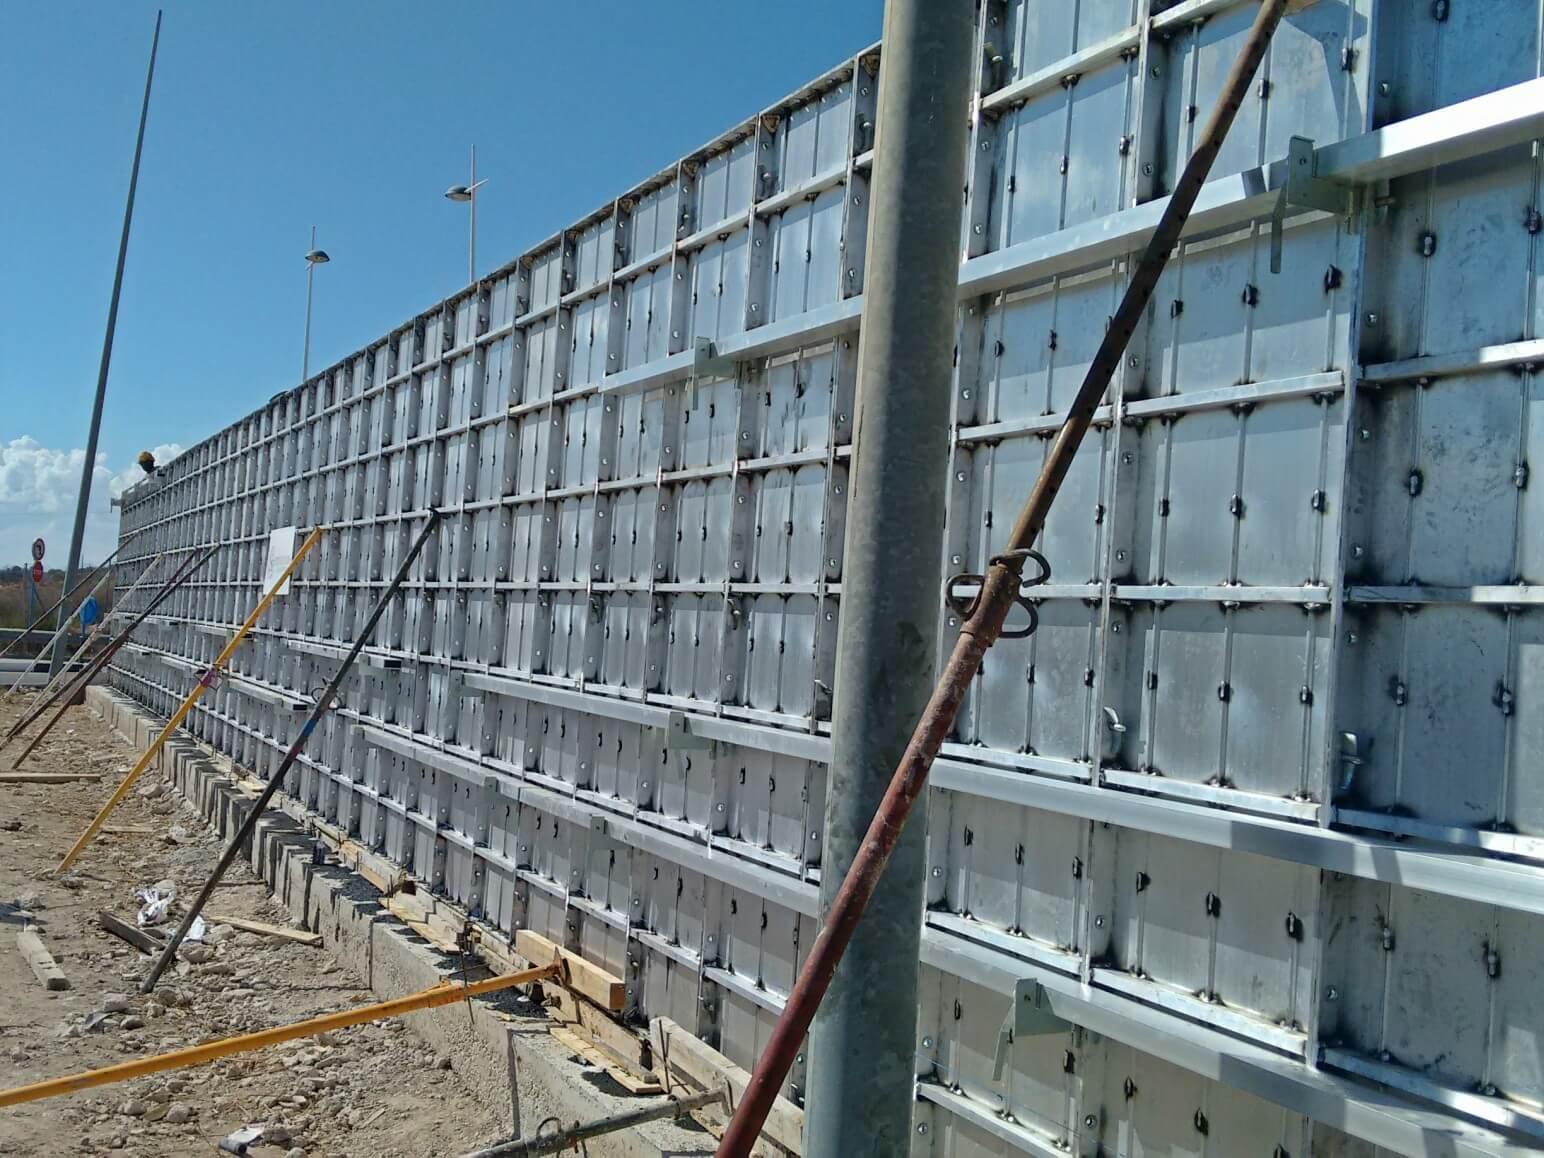 proyecto muro perimetral encofrados de aluminio construccion strong forms alicante 10